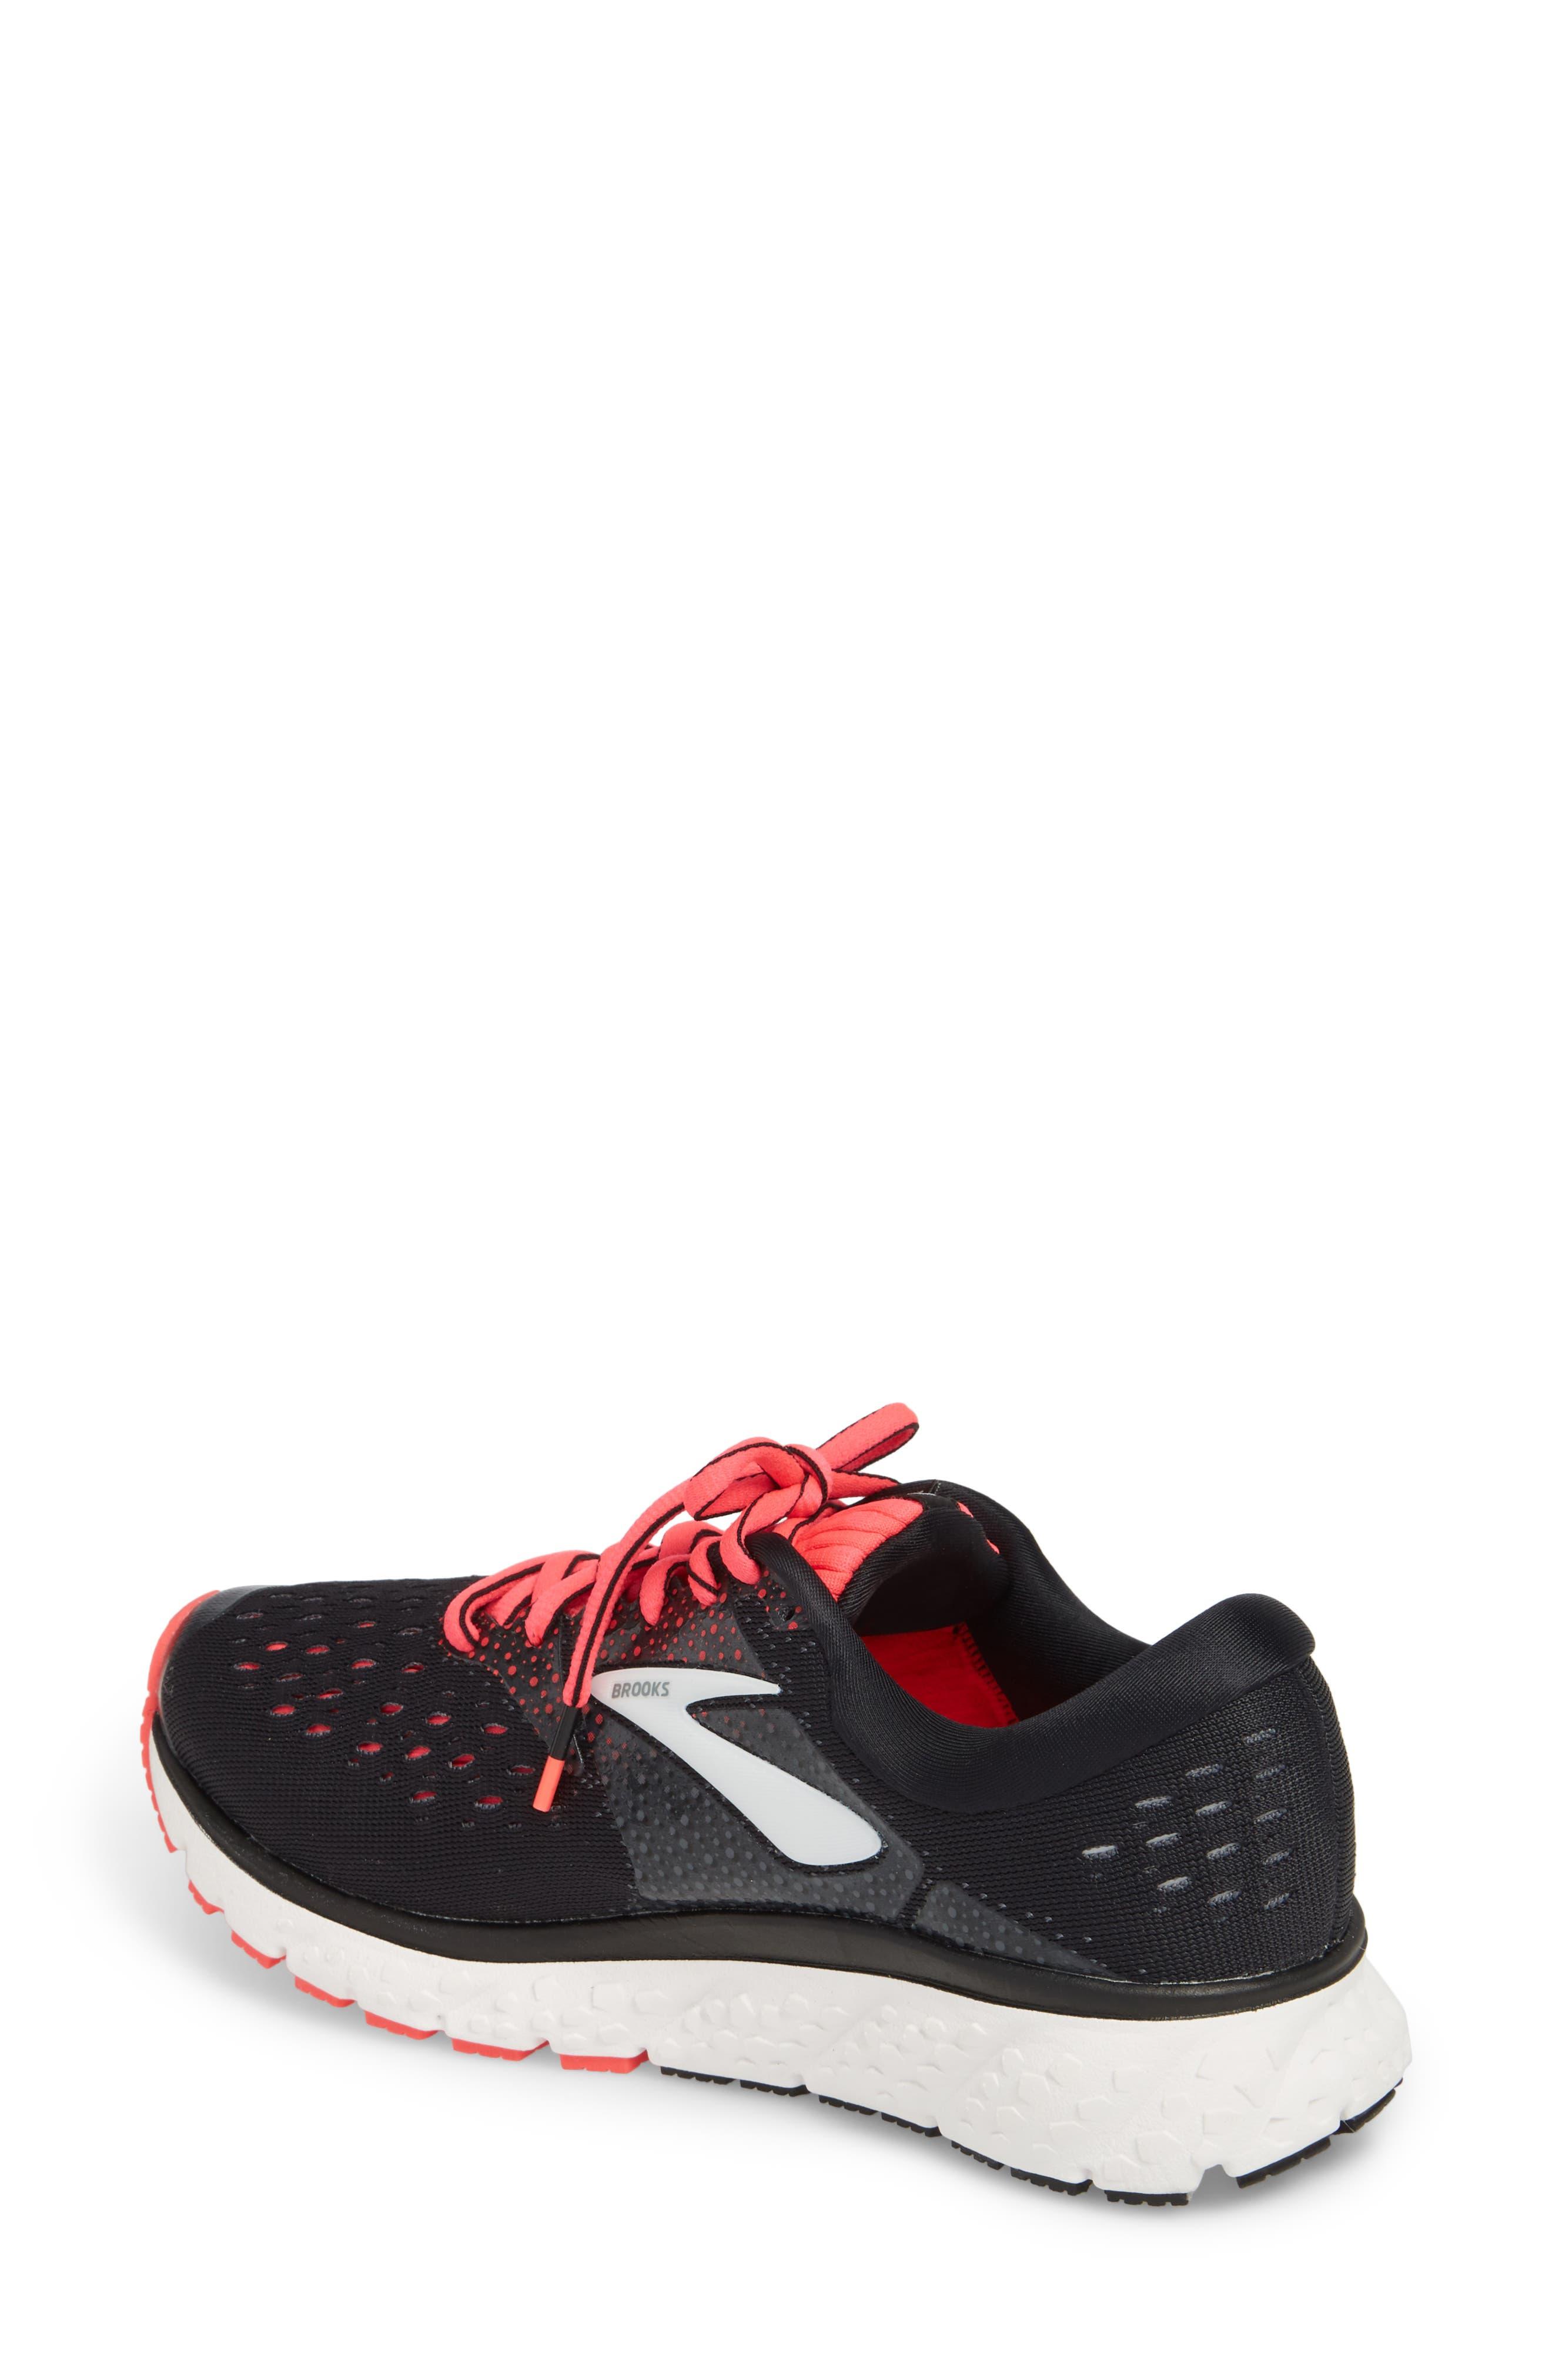 Glycerin 16 Running Shoe,                             Alternate thumbnail 2, color,                             BLACK/ PINK/ GREY